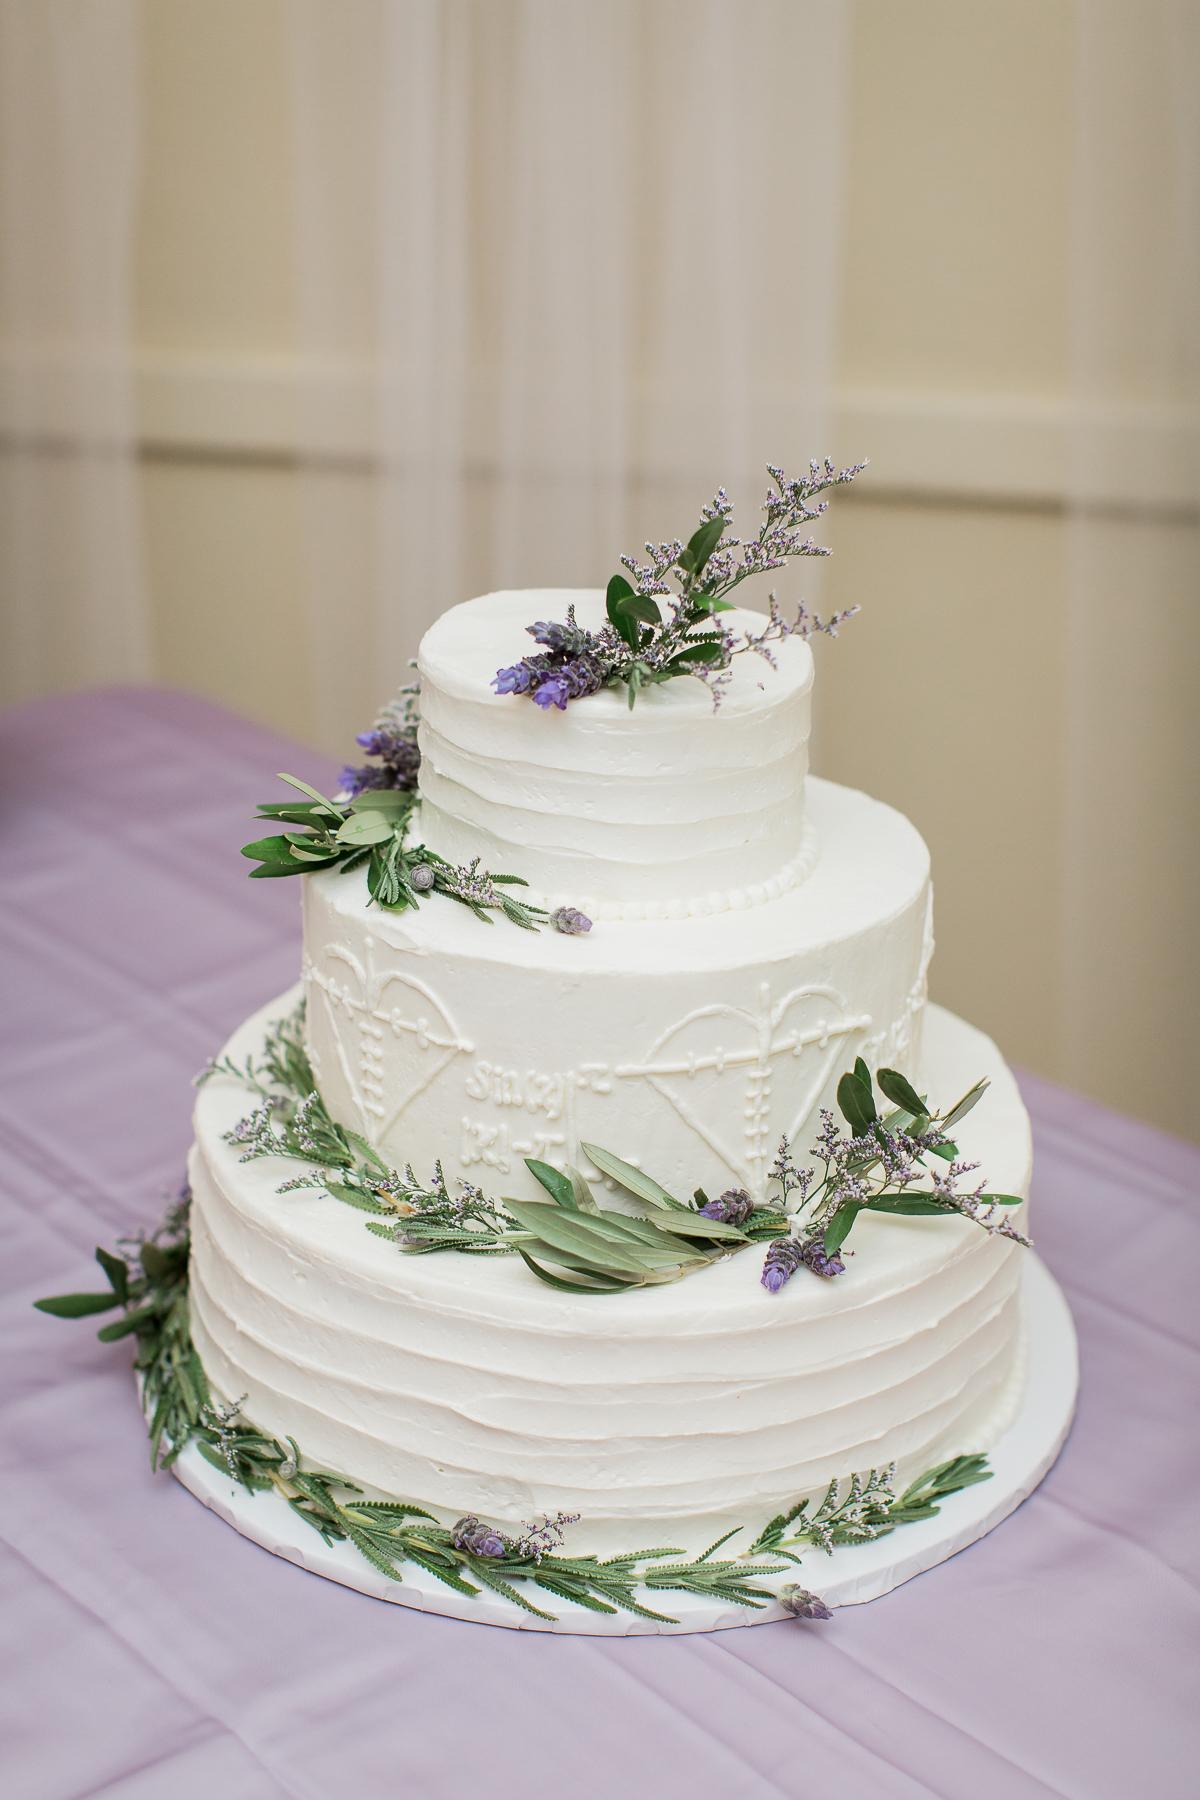 Three-tier white wedding cake